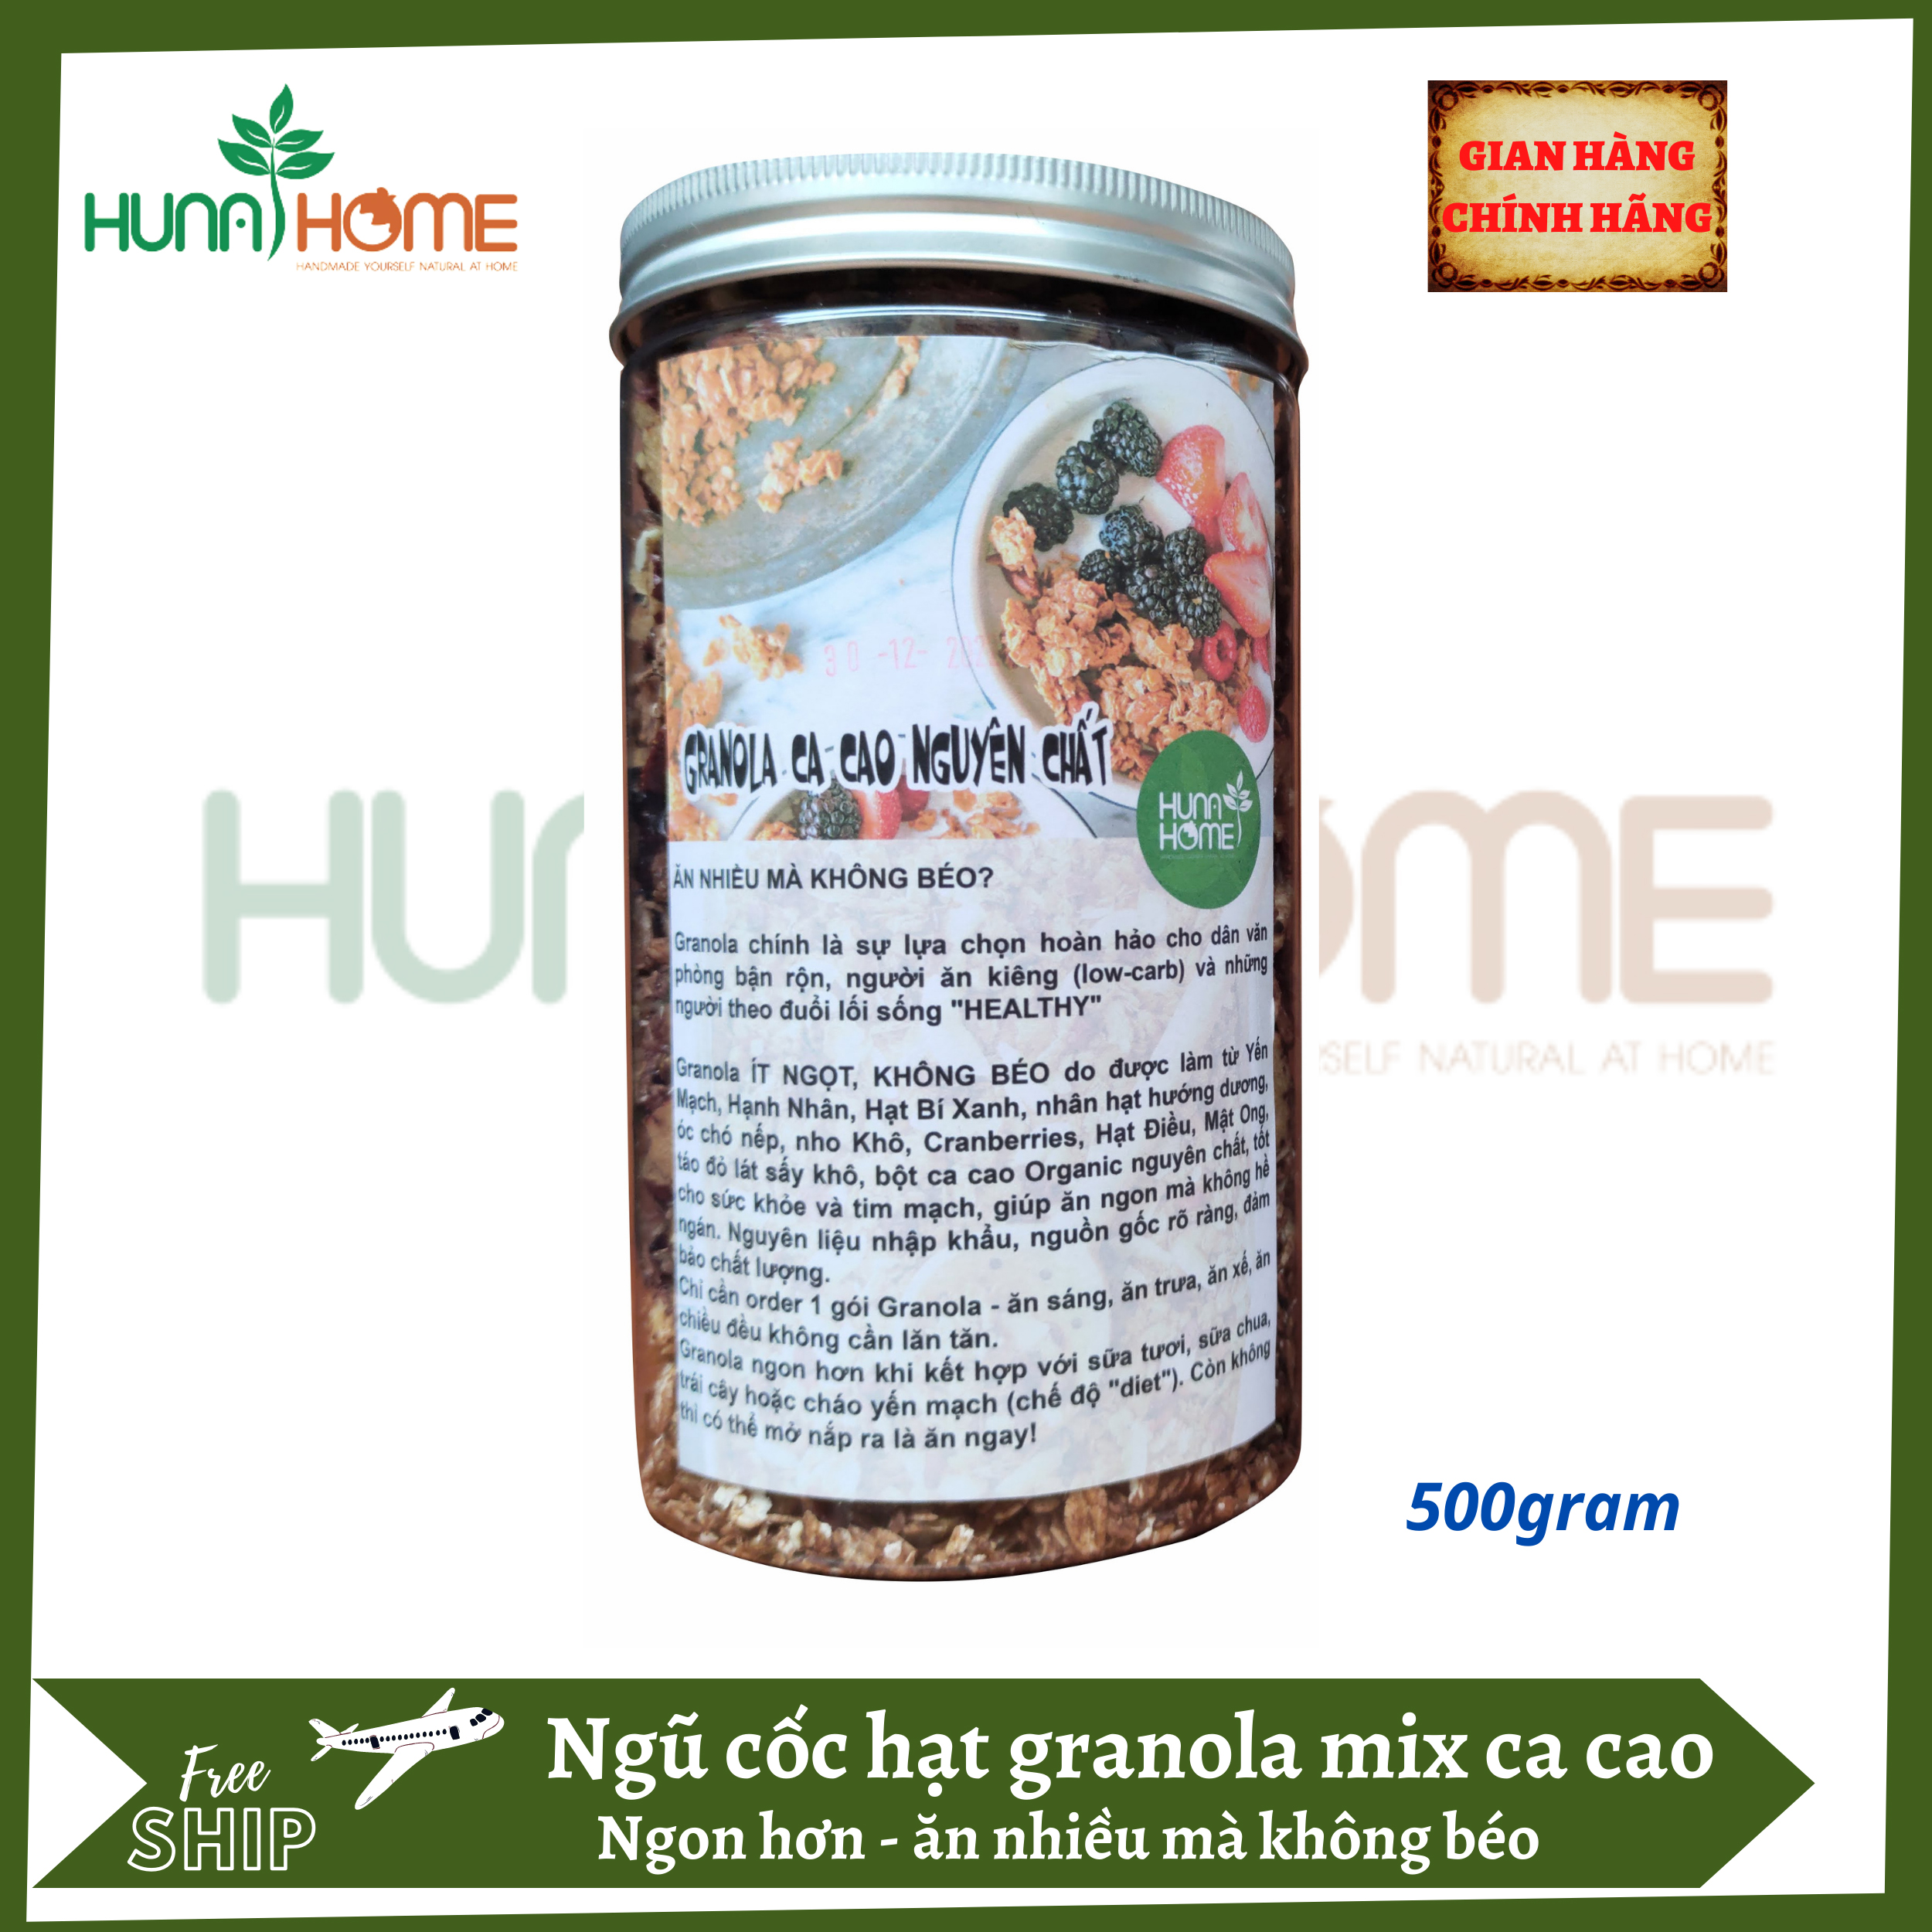 Ngũ cốc hạt granola mix cacao Hunahome